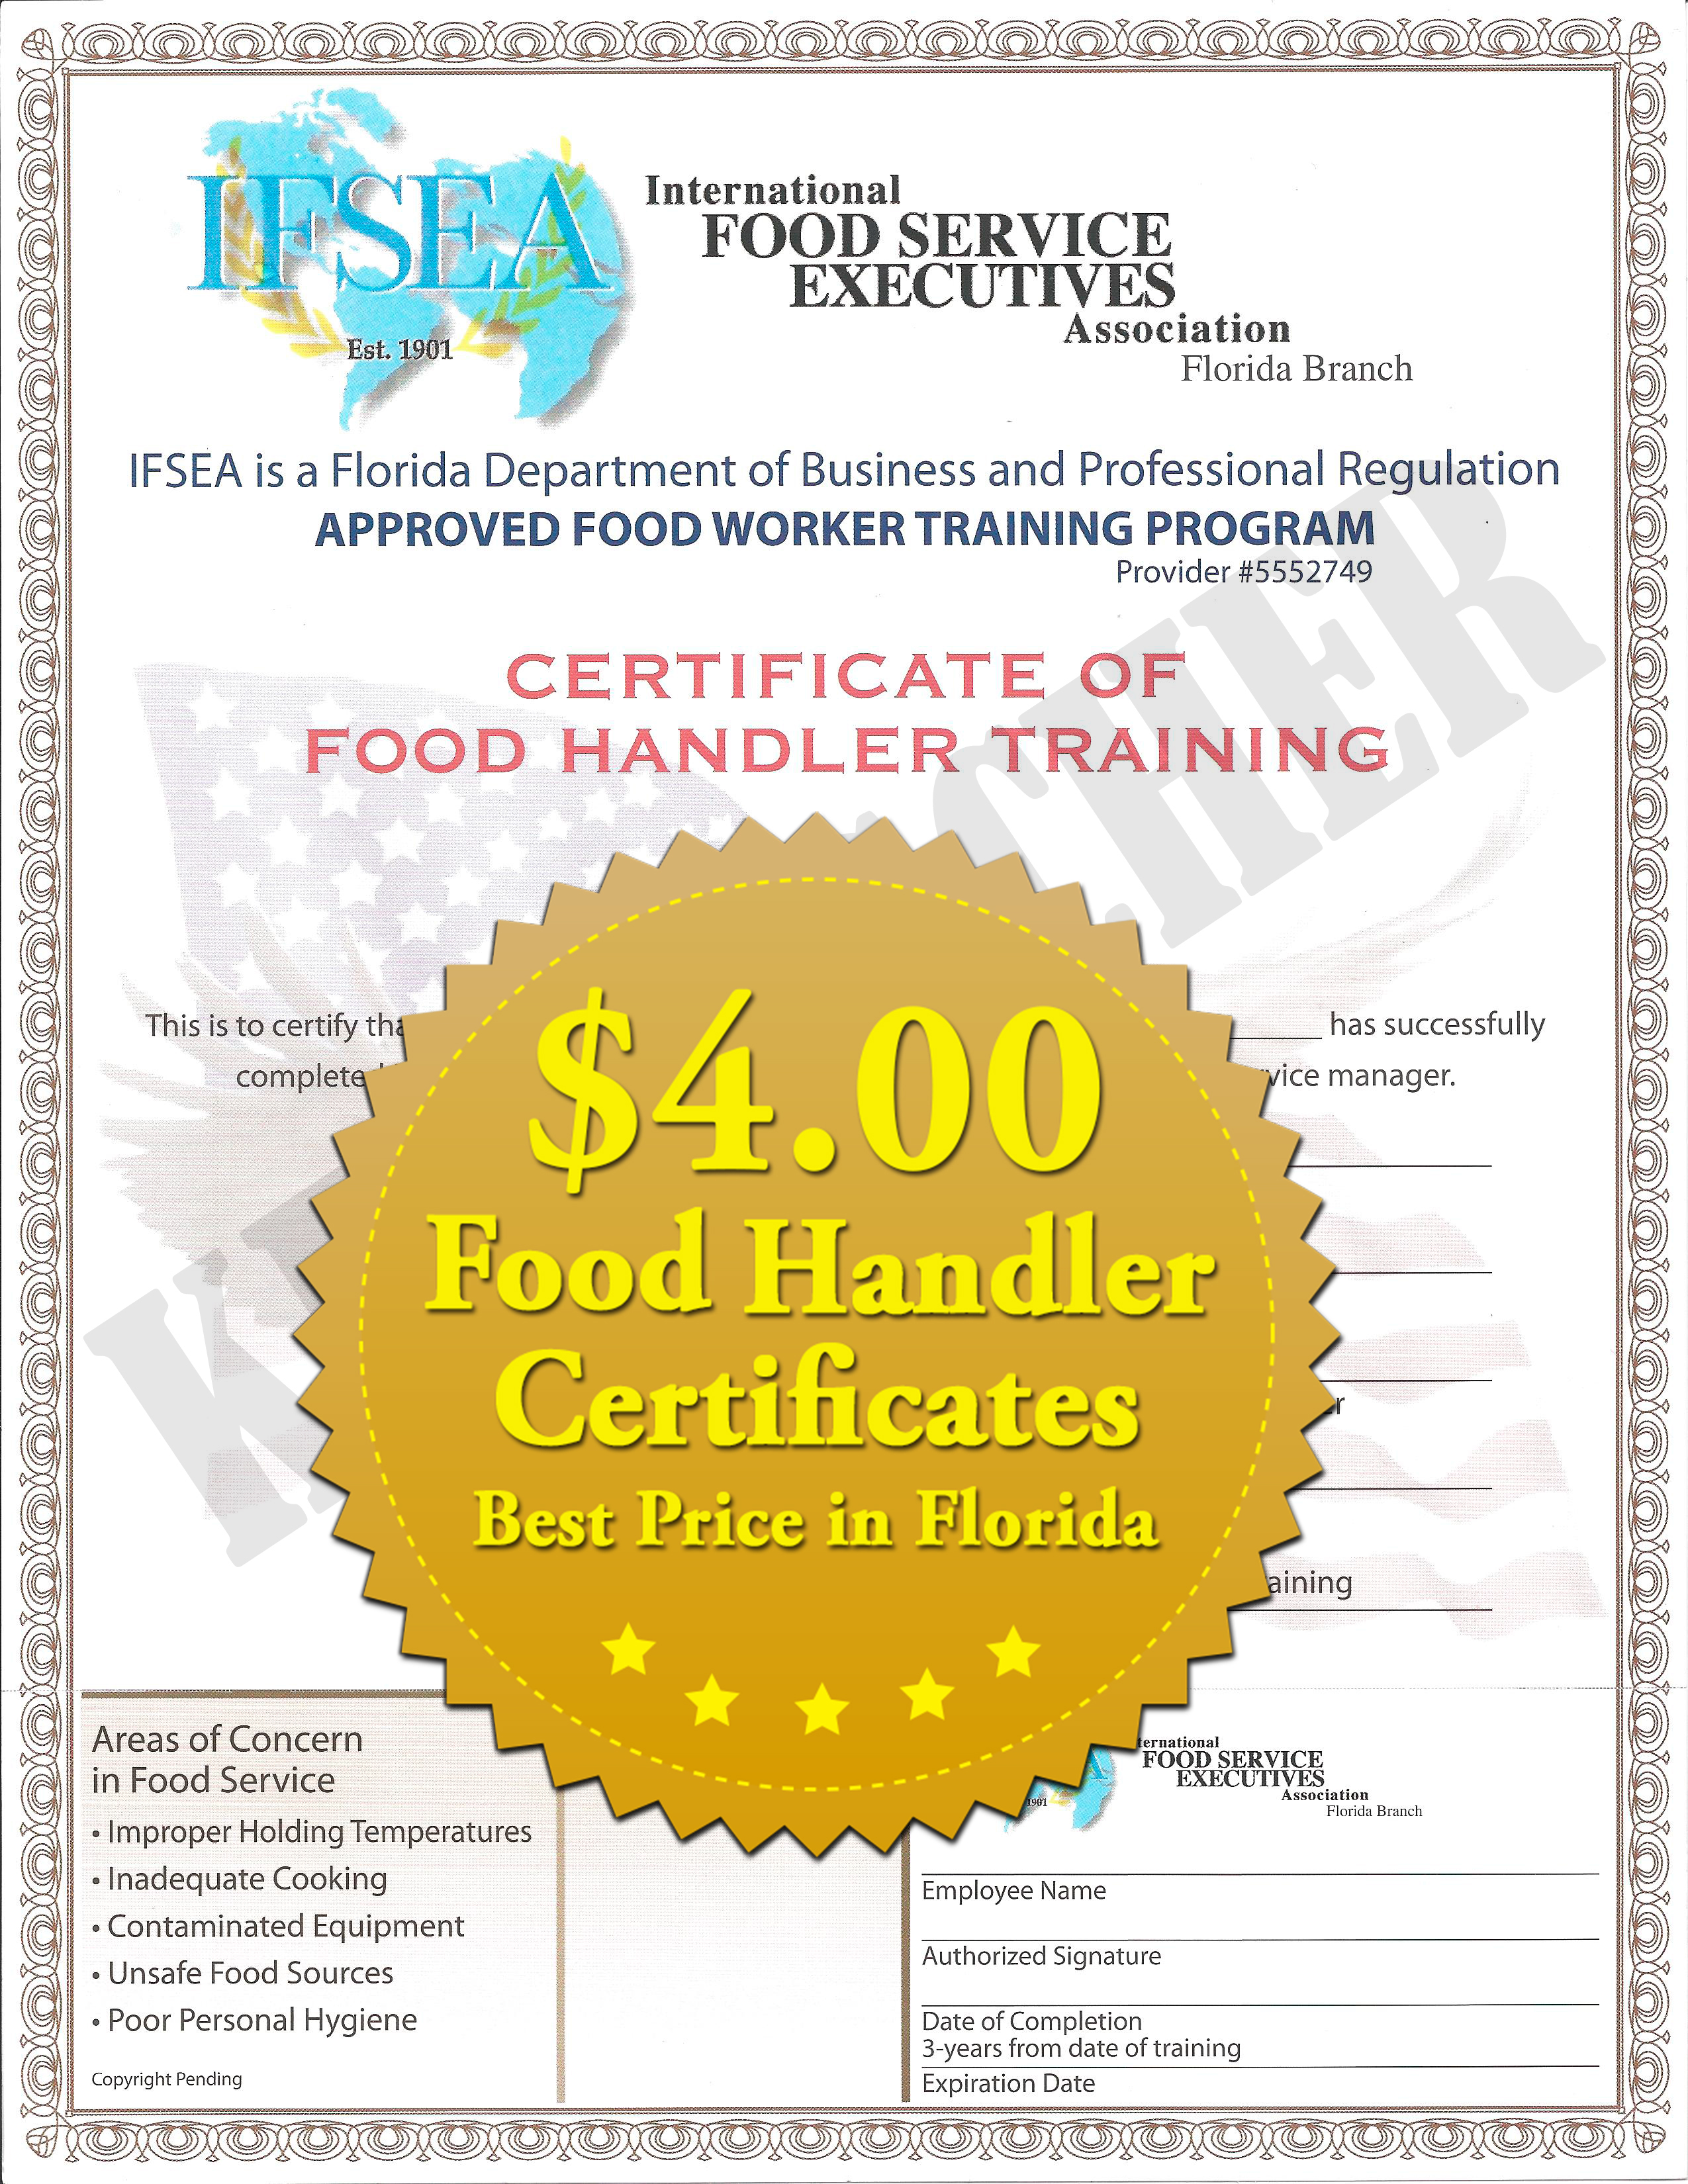 Florida Food Handler Certificate